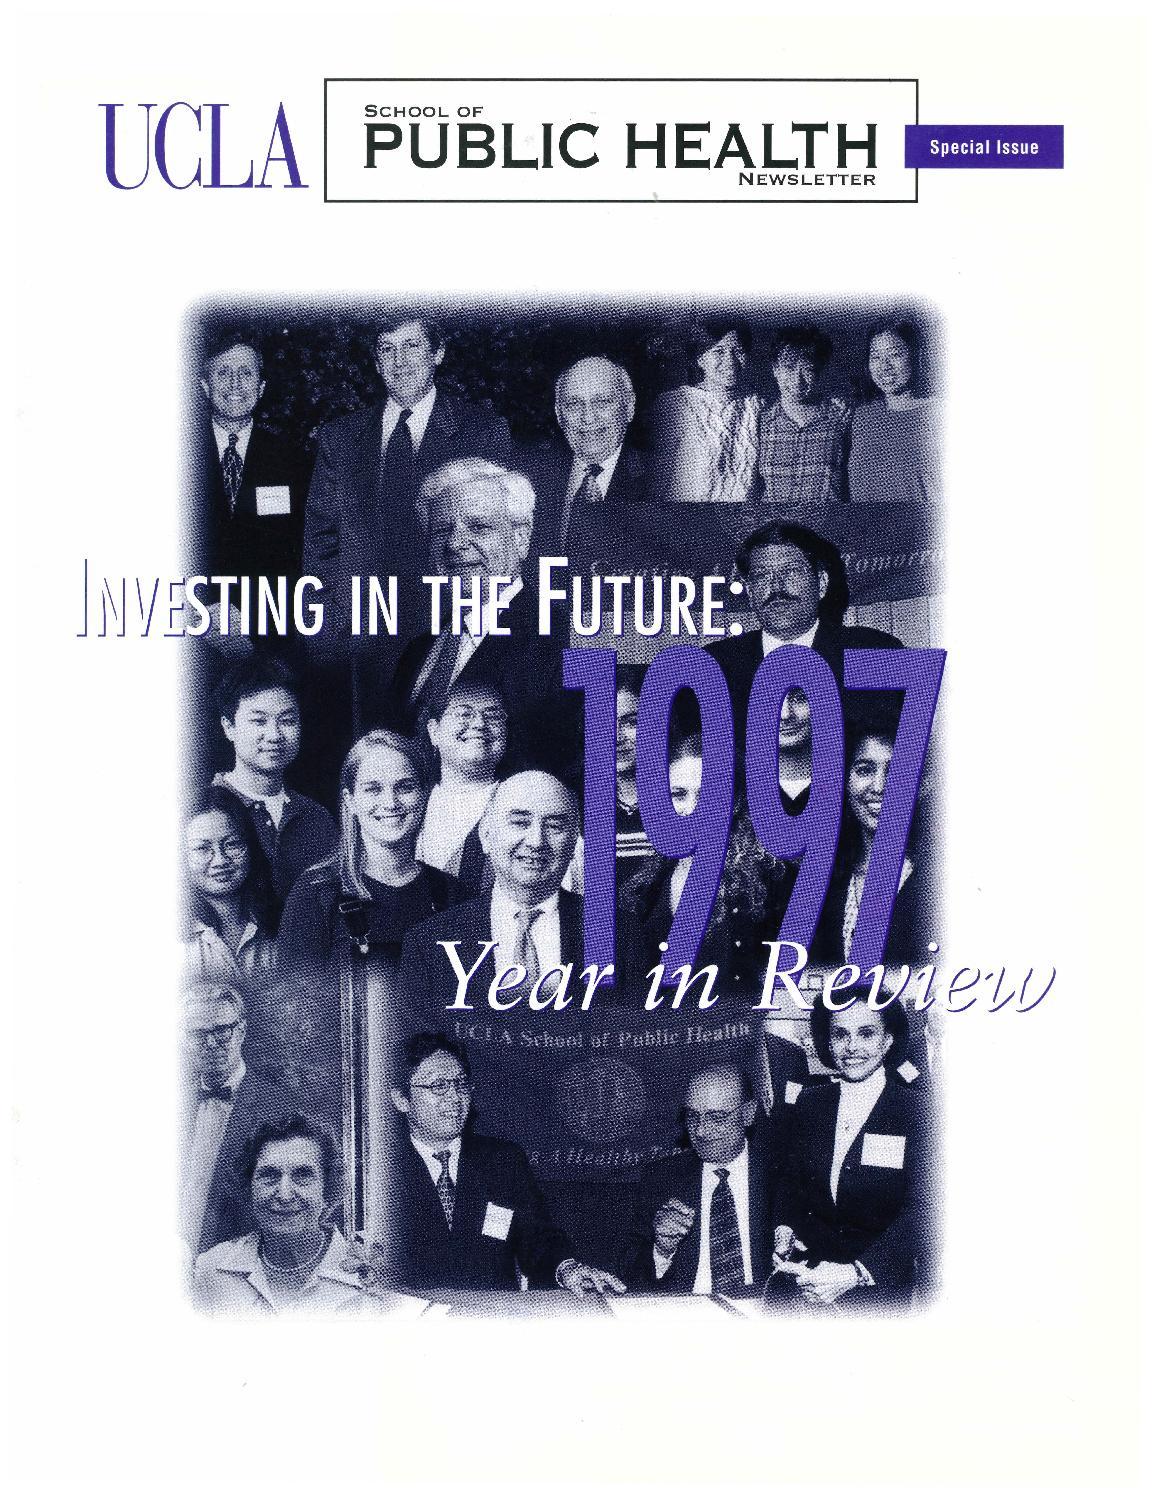 UCLA School of Public Health Newsletter - 1997 Year in